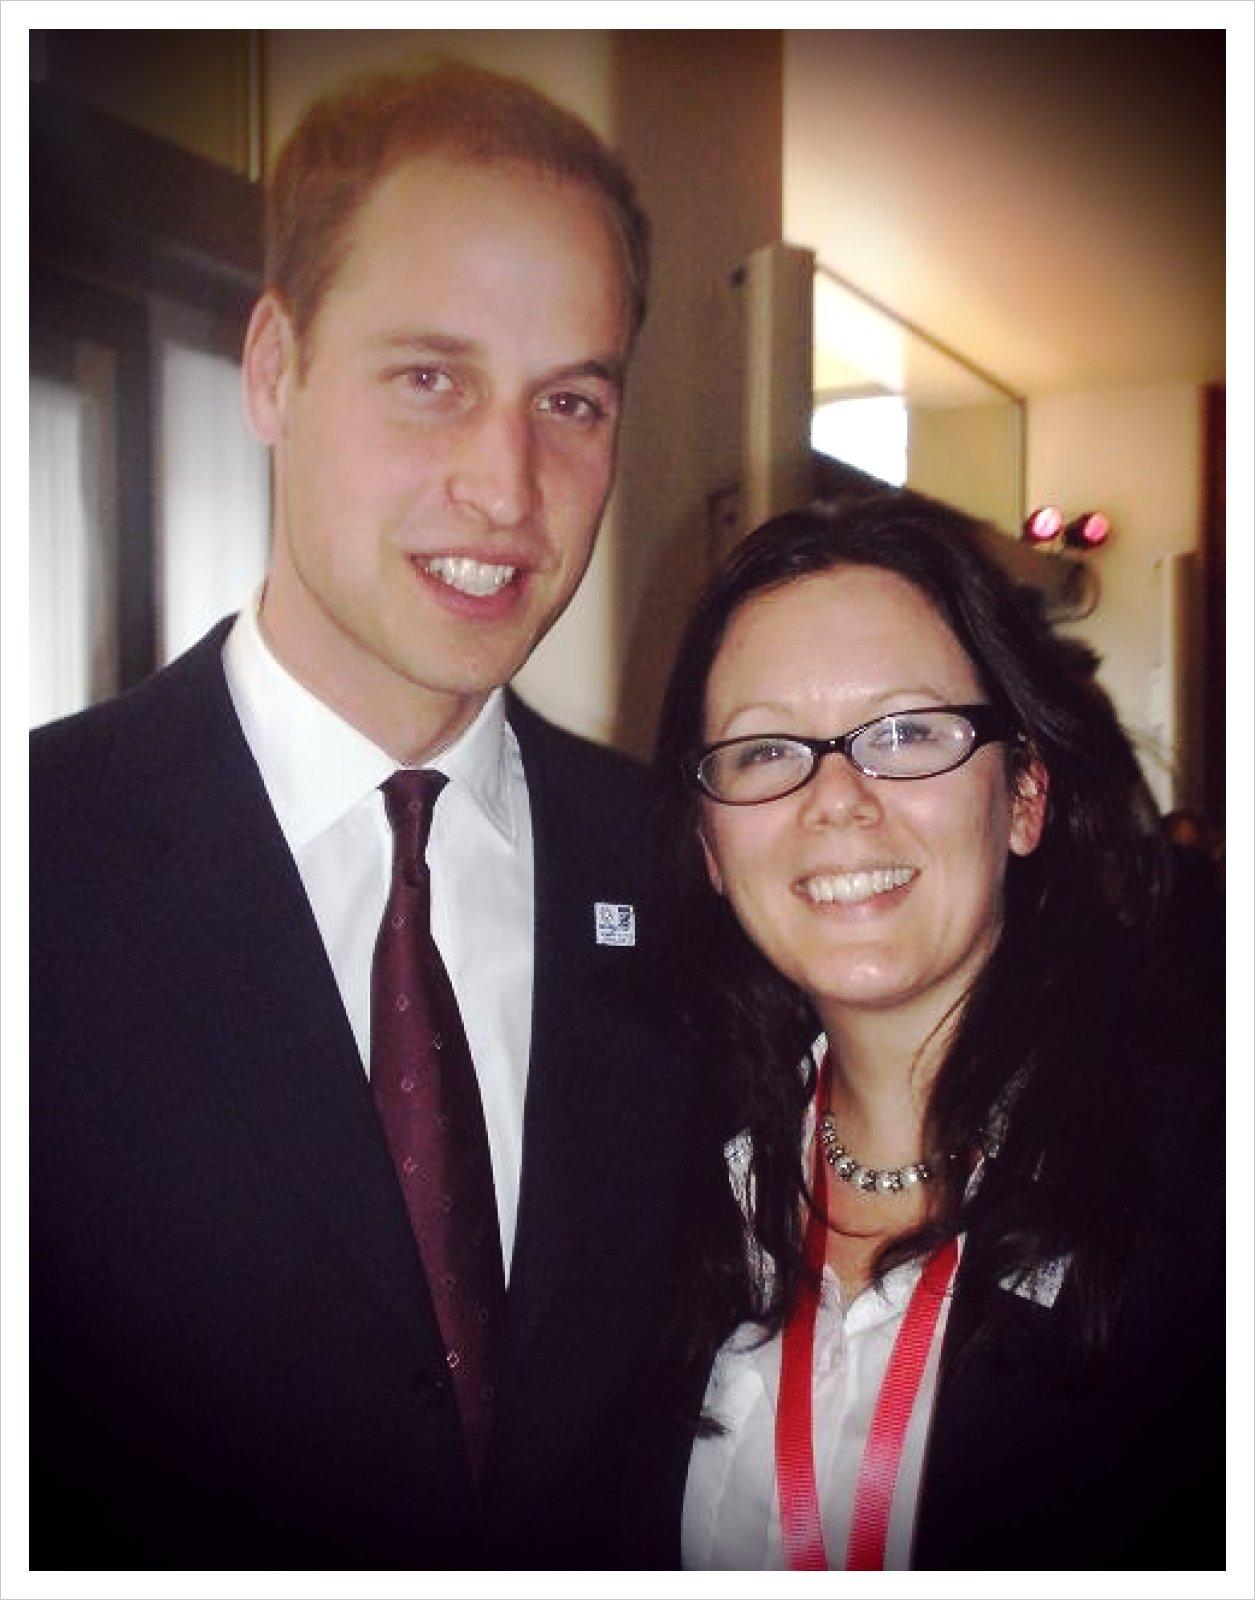 Prince William - future king